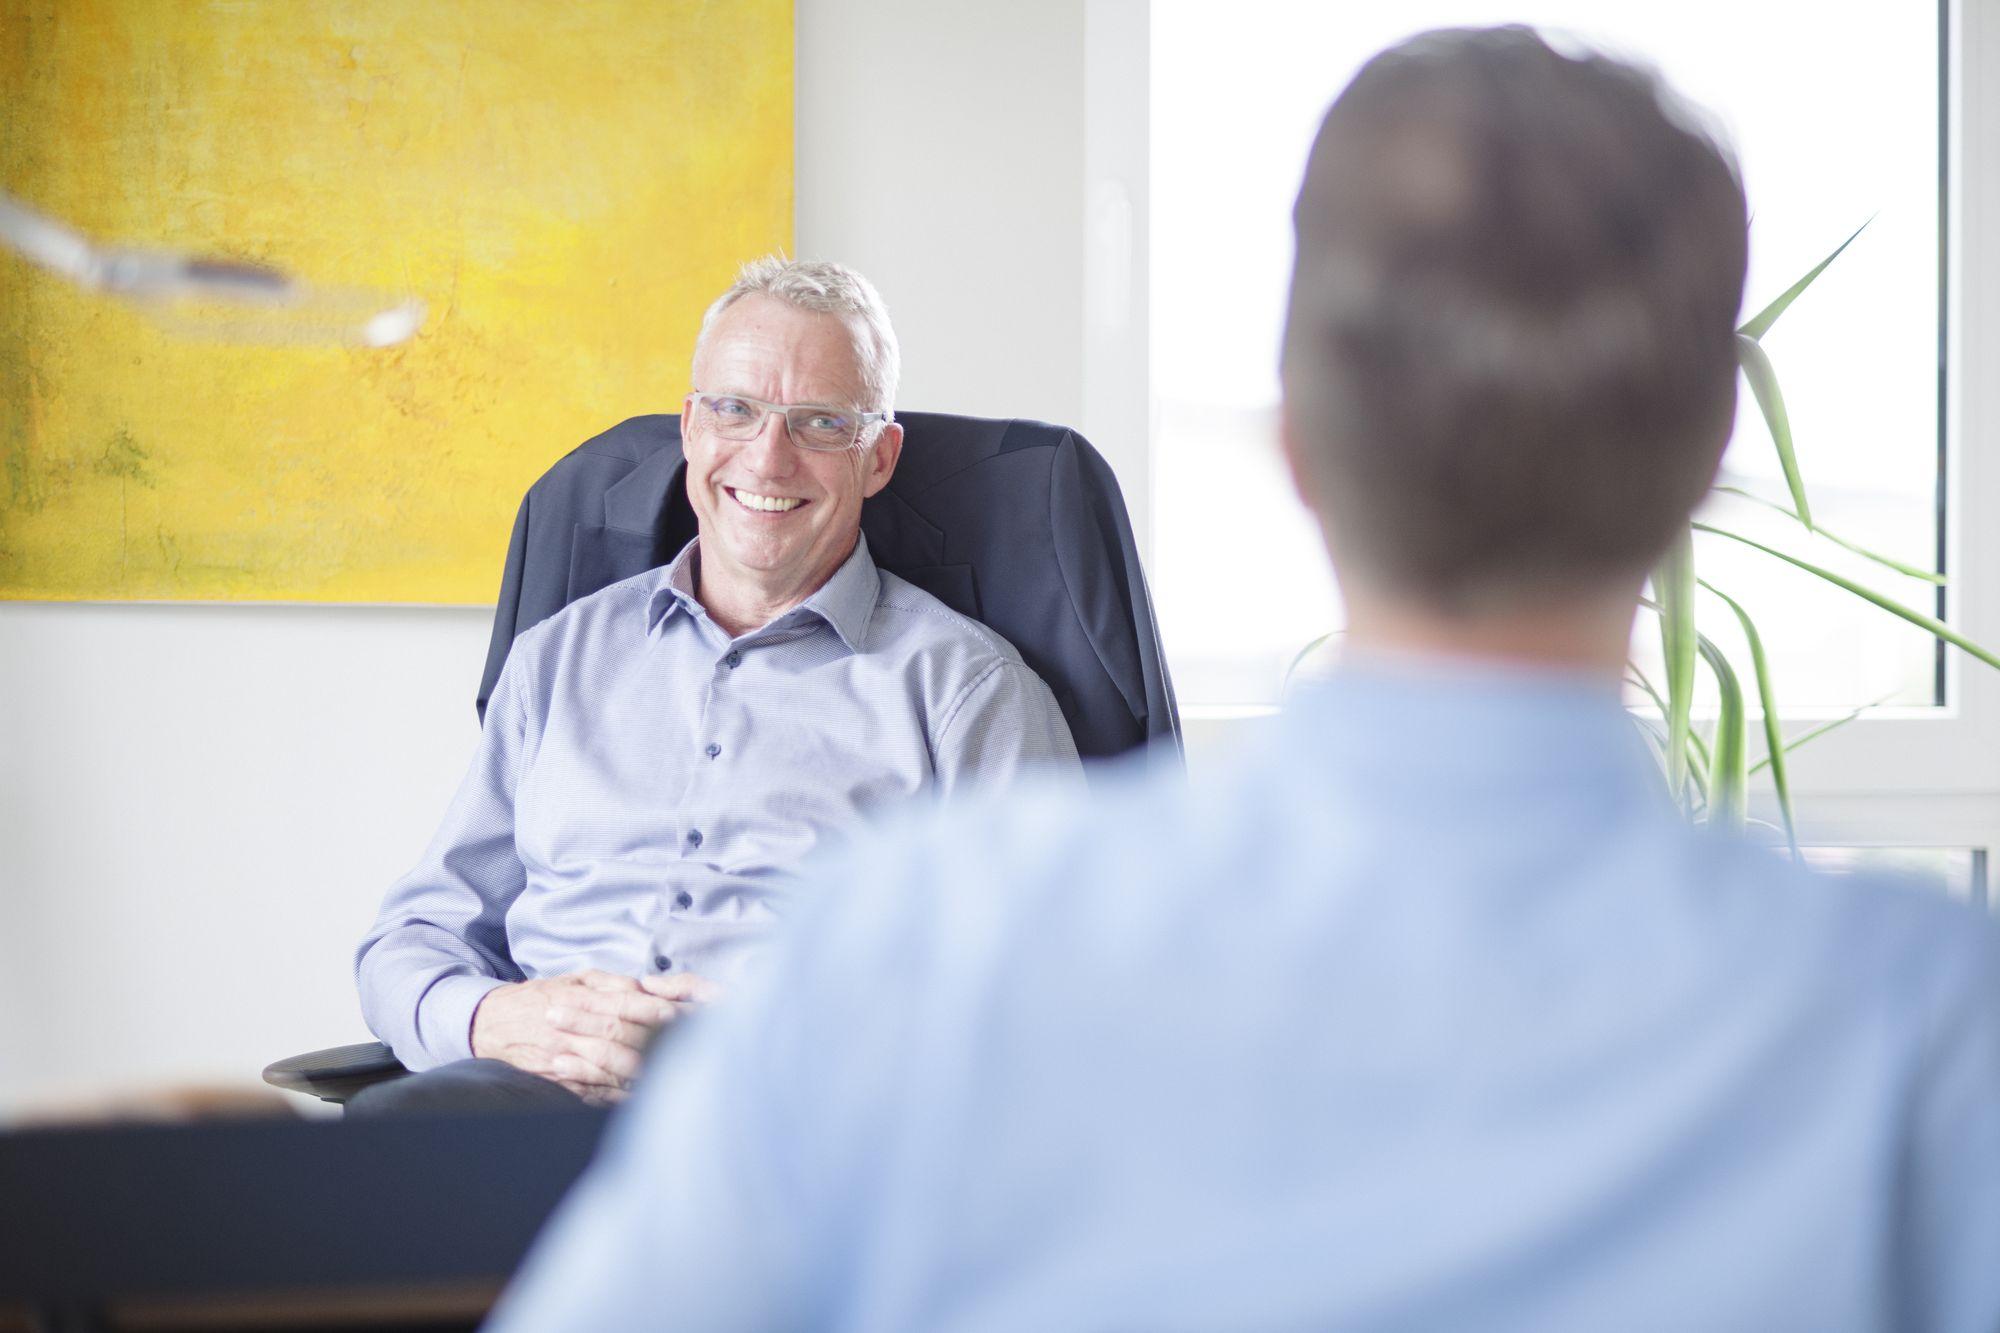 Hinnenthal Consulting Unternehmensberatung